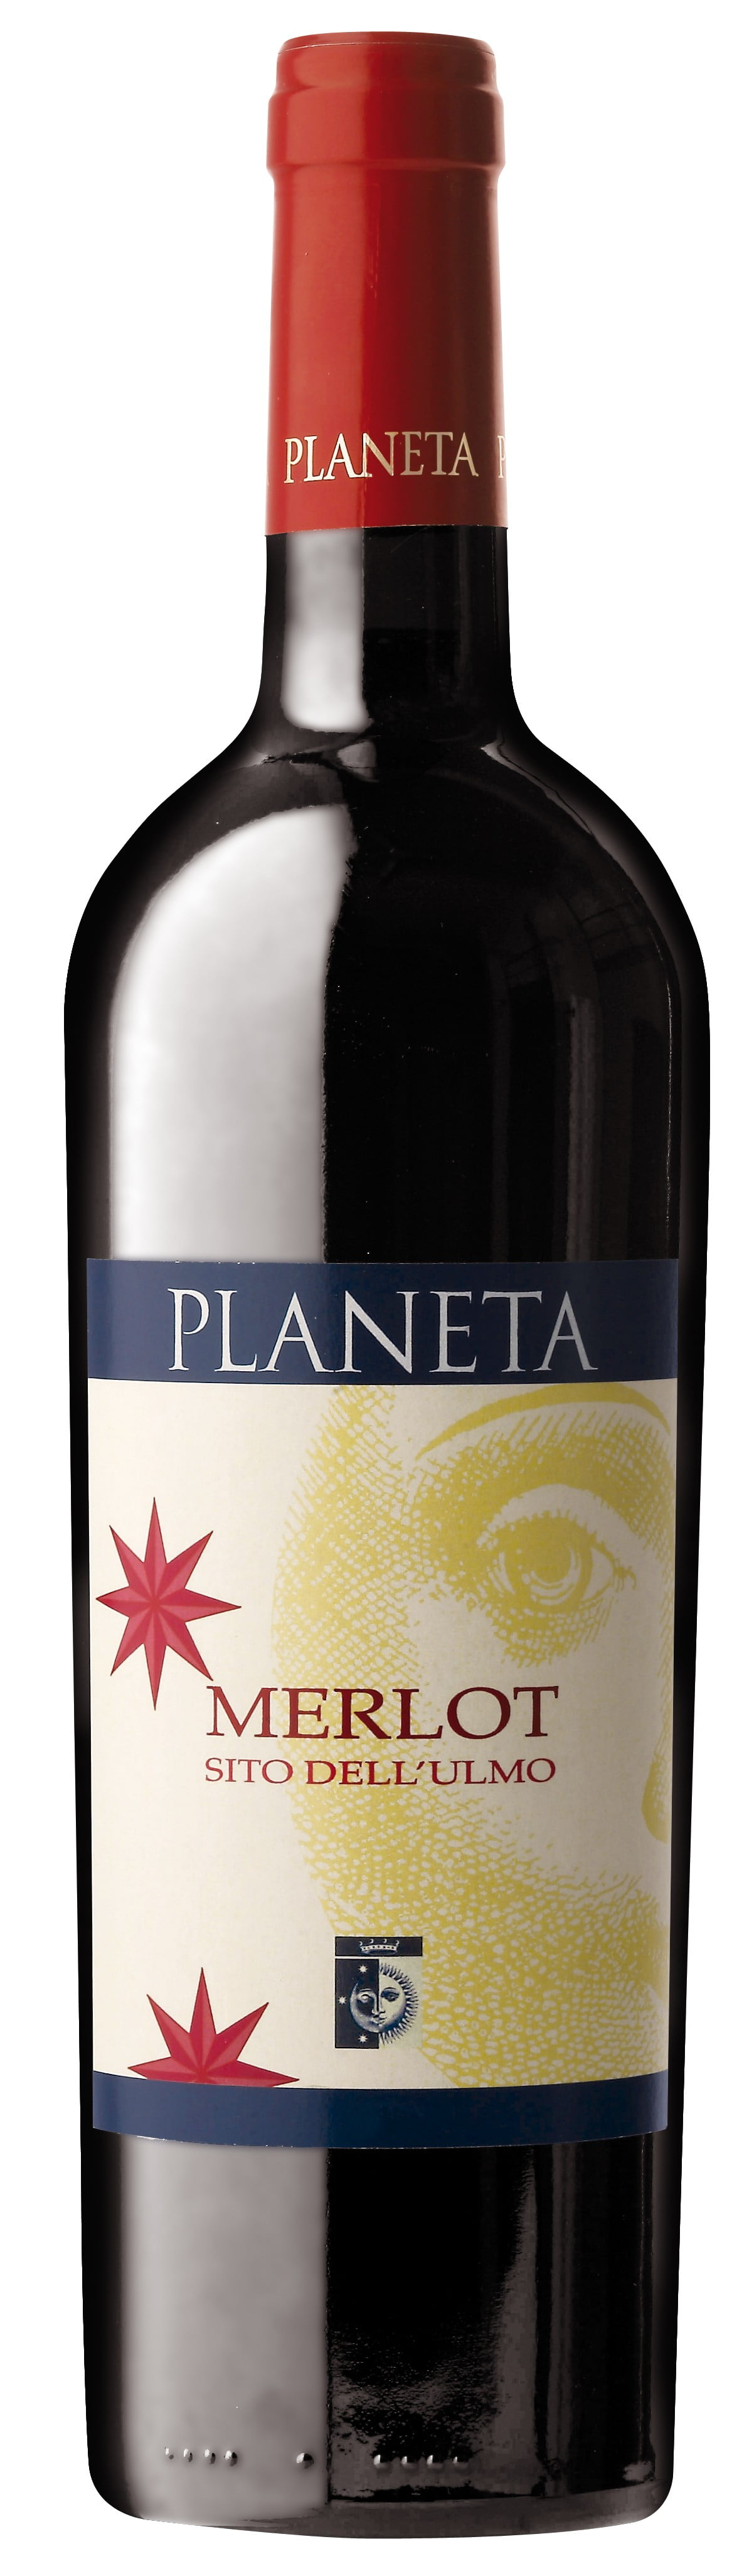 Planeta Merlot